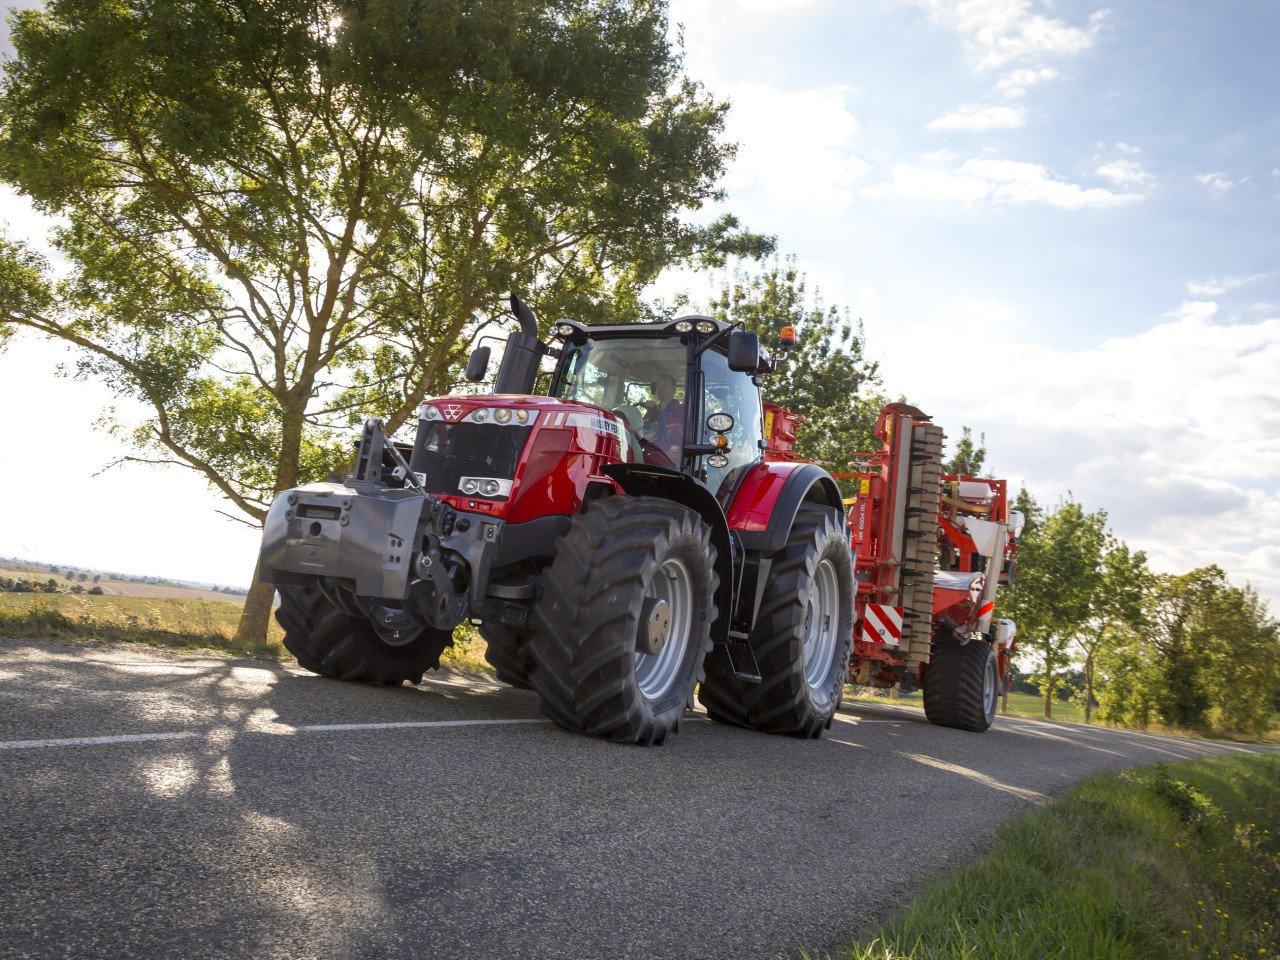 Трактор Массей Фергюсон 8737: купити MF 8737 в Україні - Bizontech